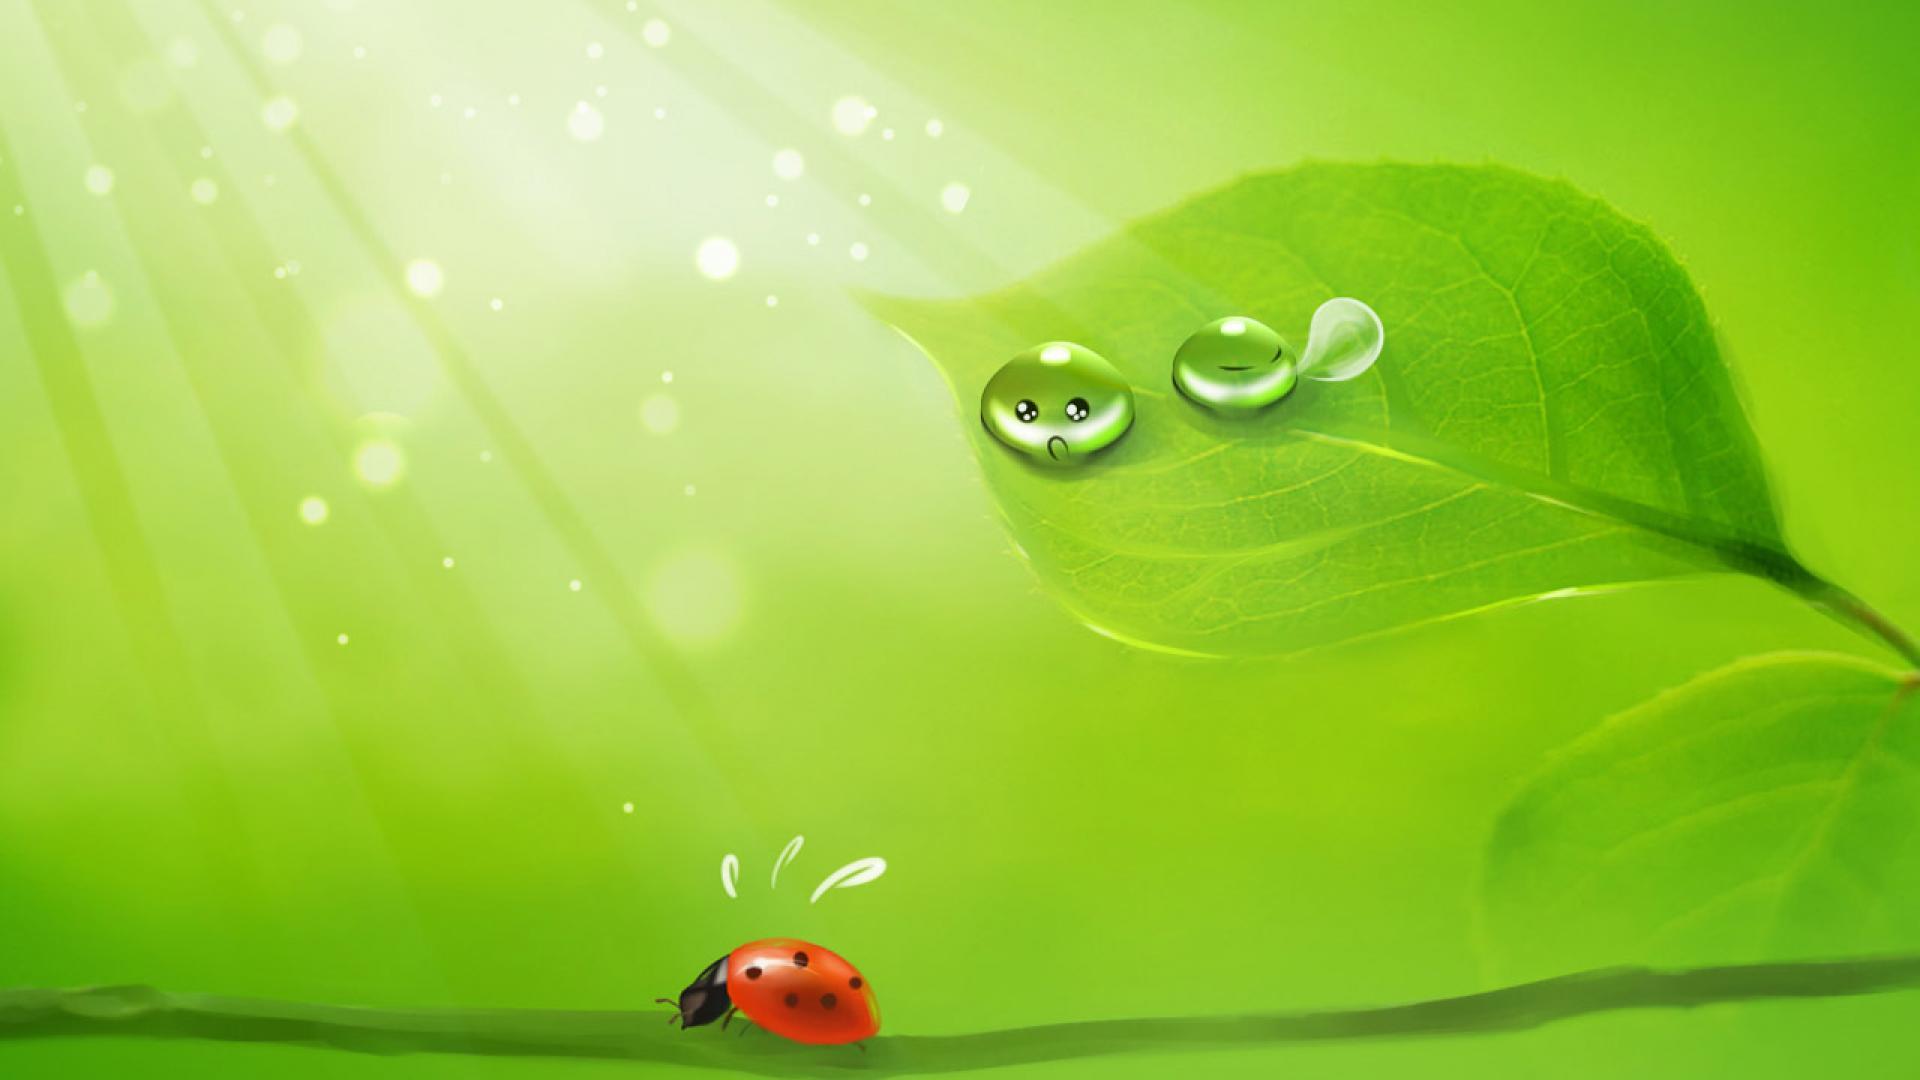 17 Best ideas about Cute Desktop Wallpaper on Pinterest   Desktop